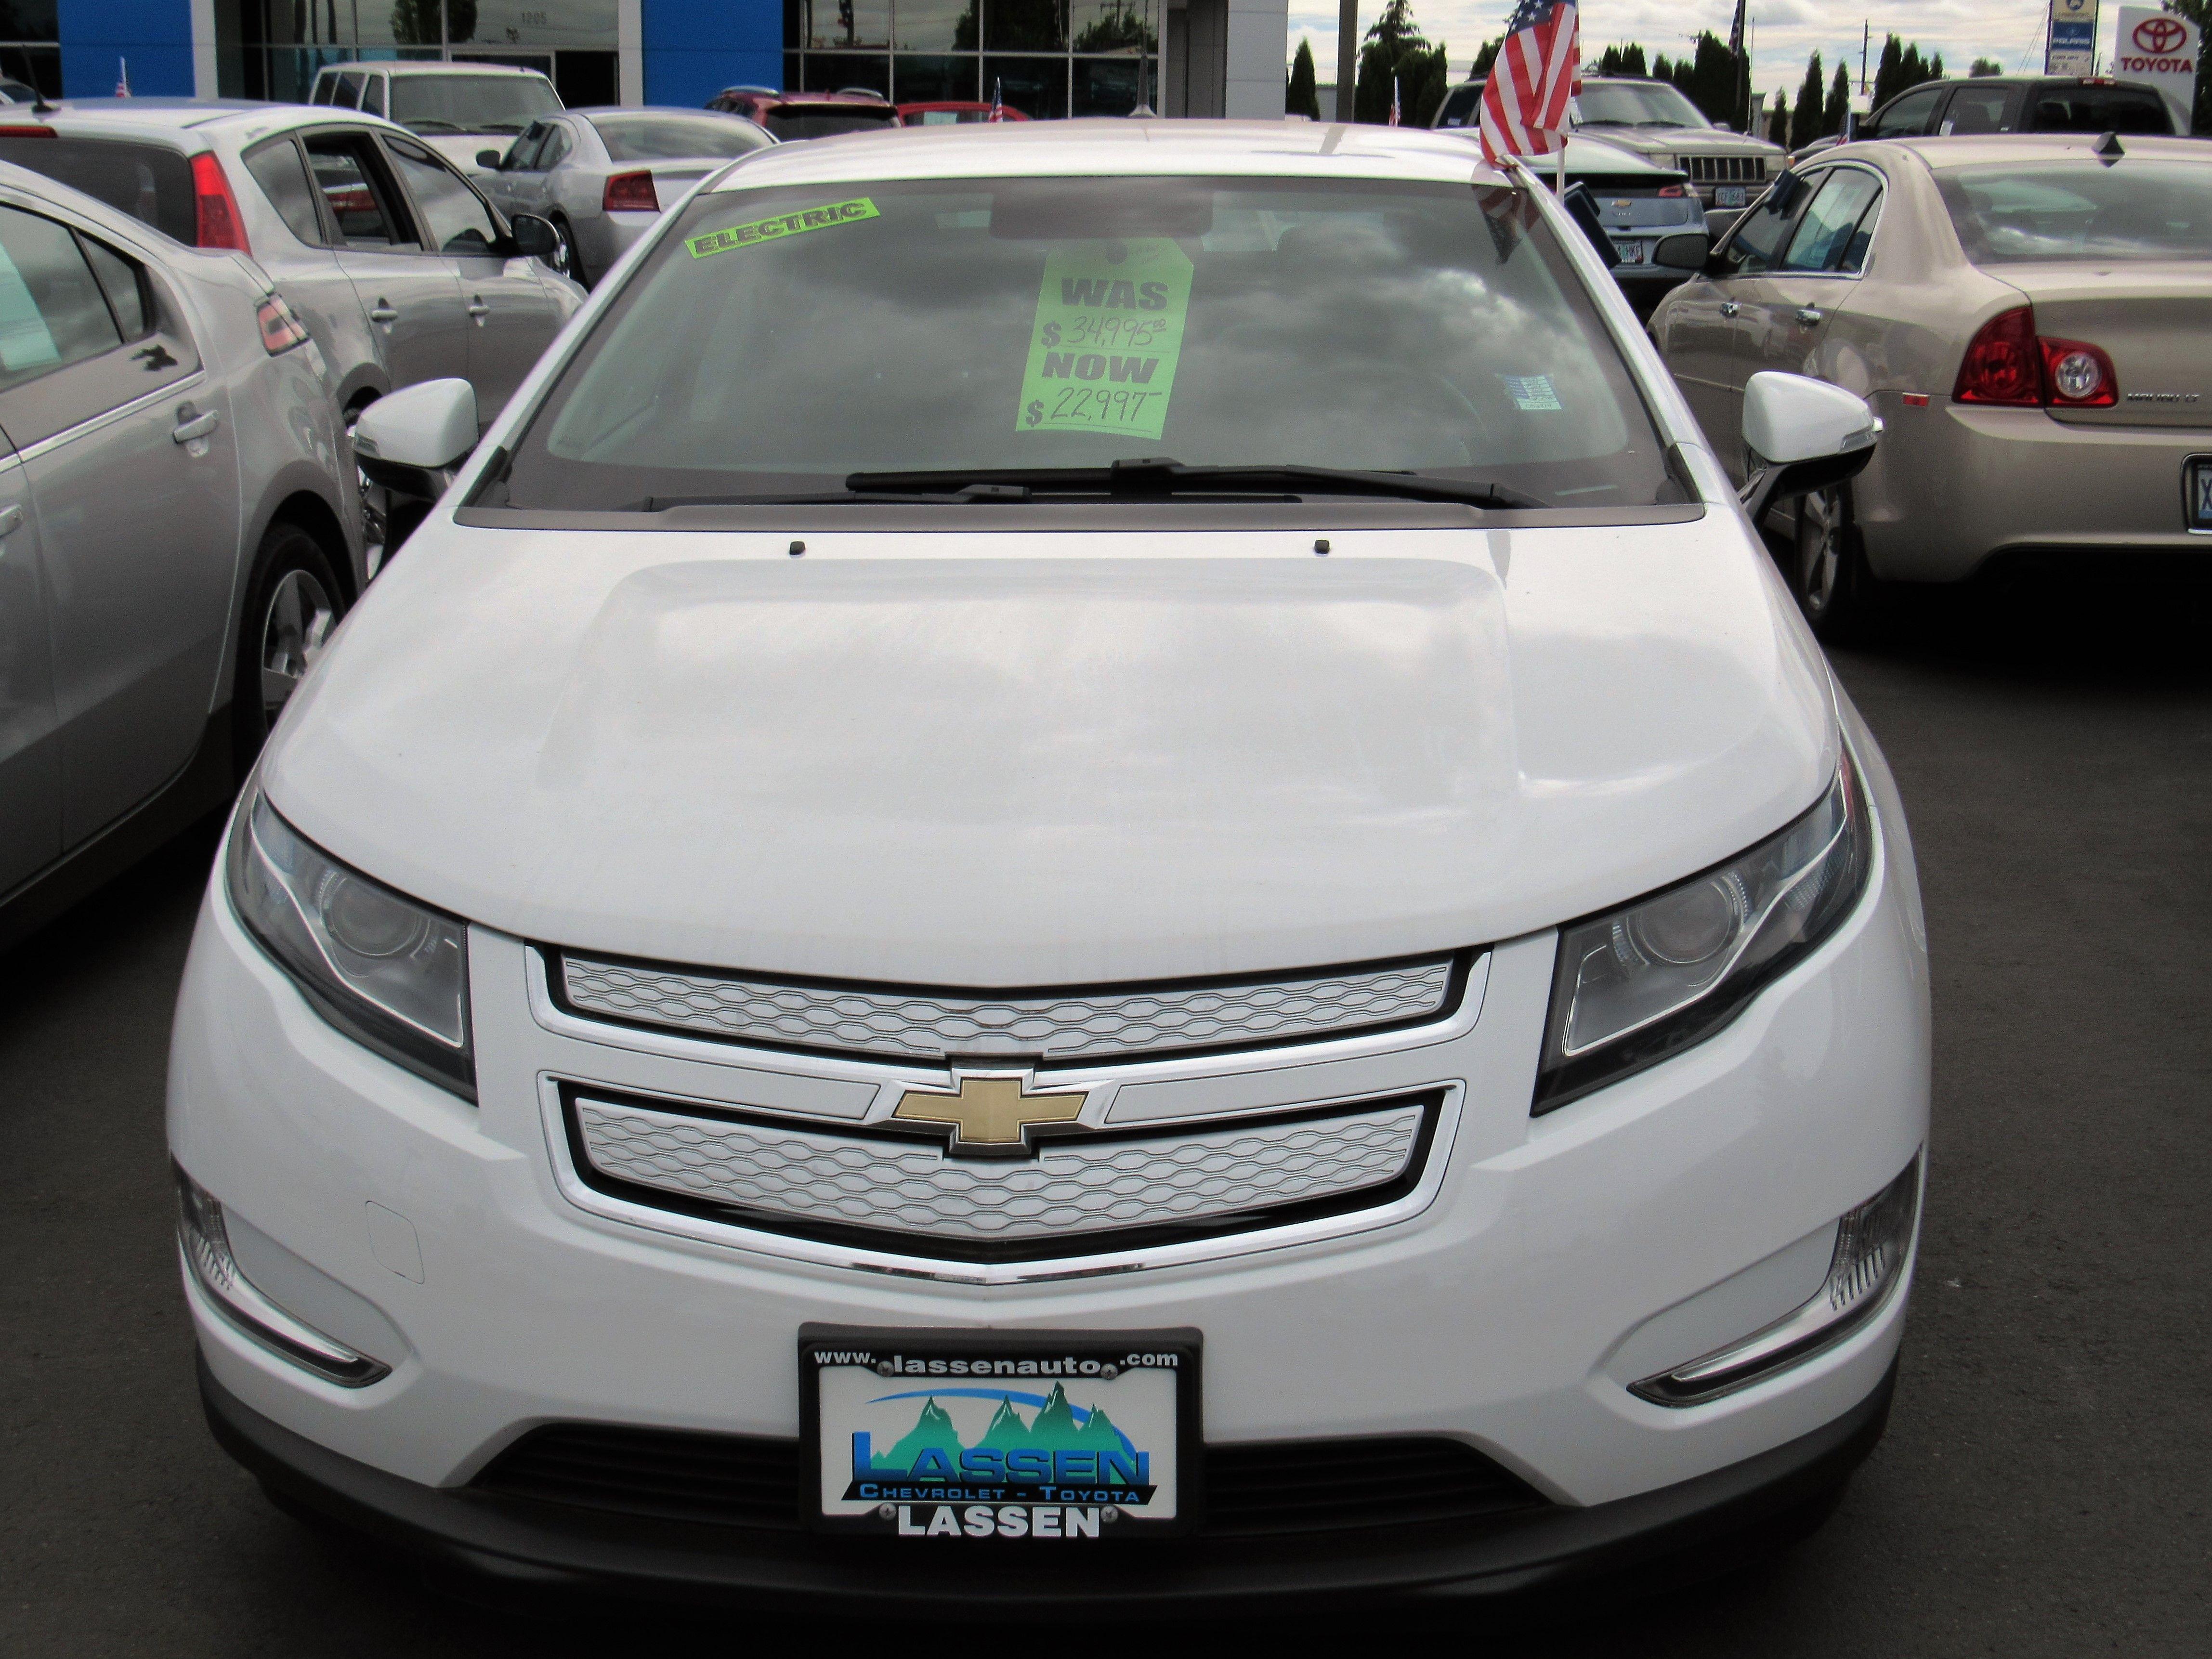 Superior Call (541) 926 4236 For Details 2014 Chevrolet Volt Stock # 4539 Lassen  Chevrolet/Toyota Albany, OR 97322